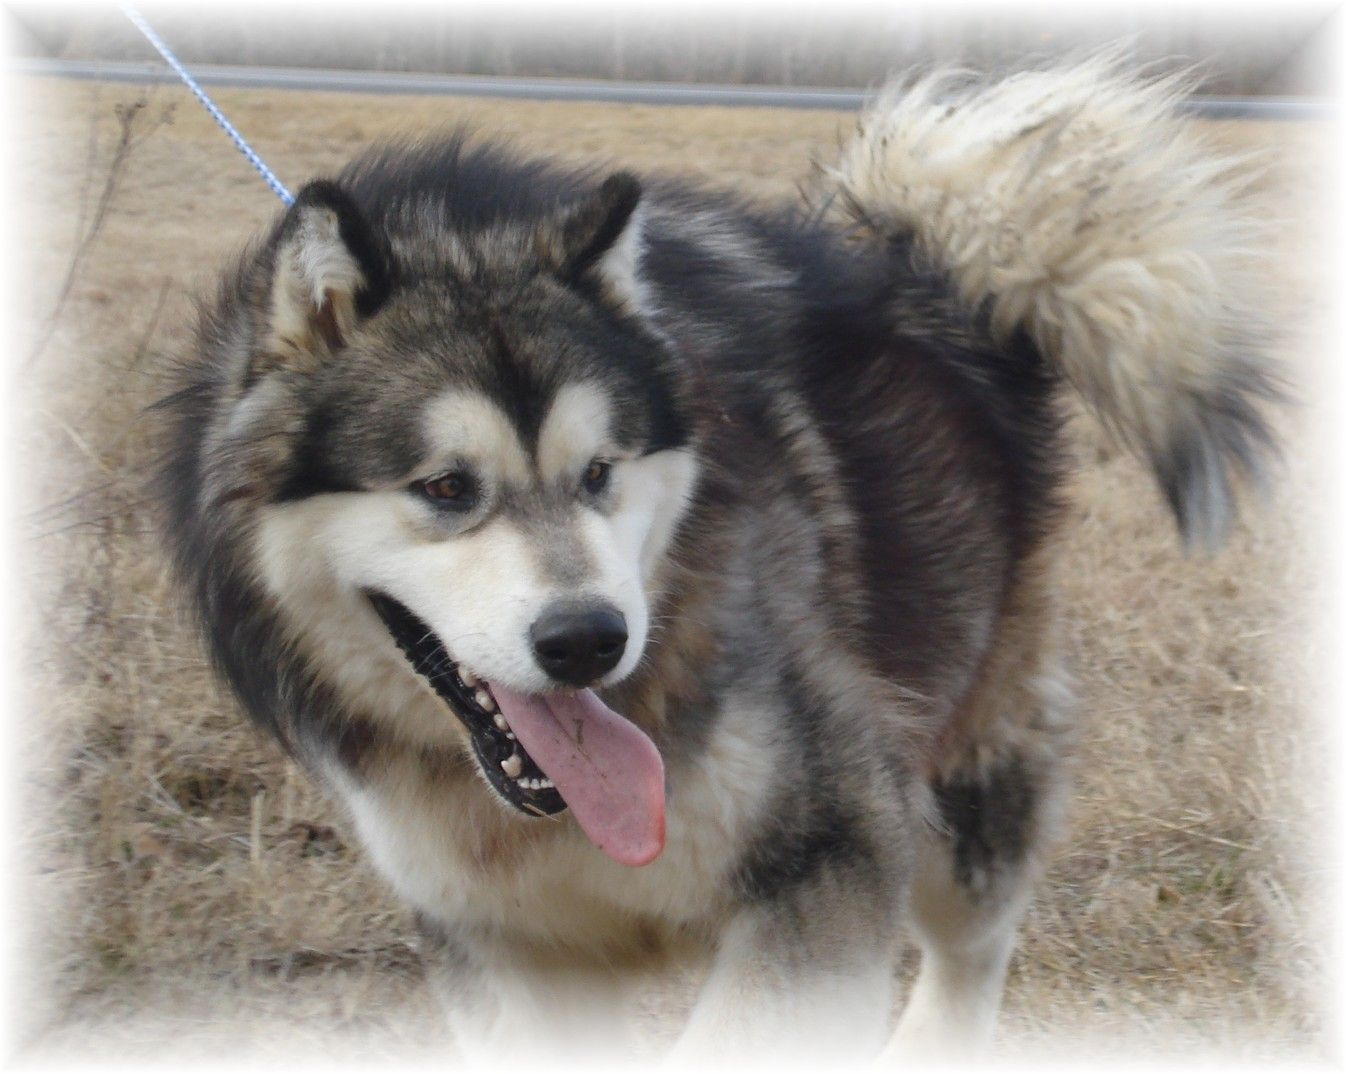 Tatonka Giant Alaskan Malamutes Puppies For Sale Alaskan Malamute